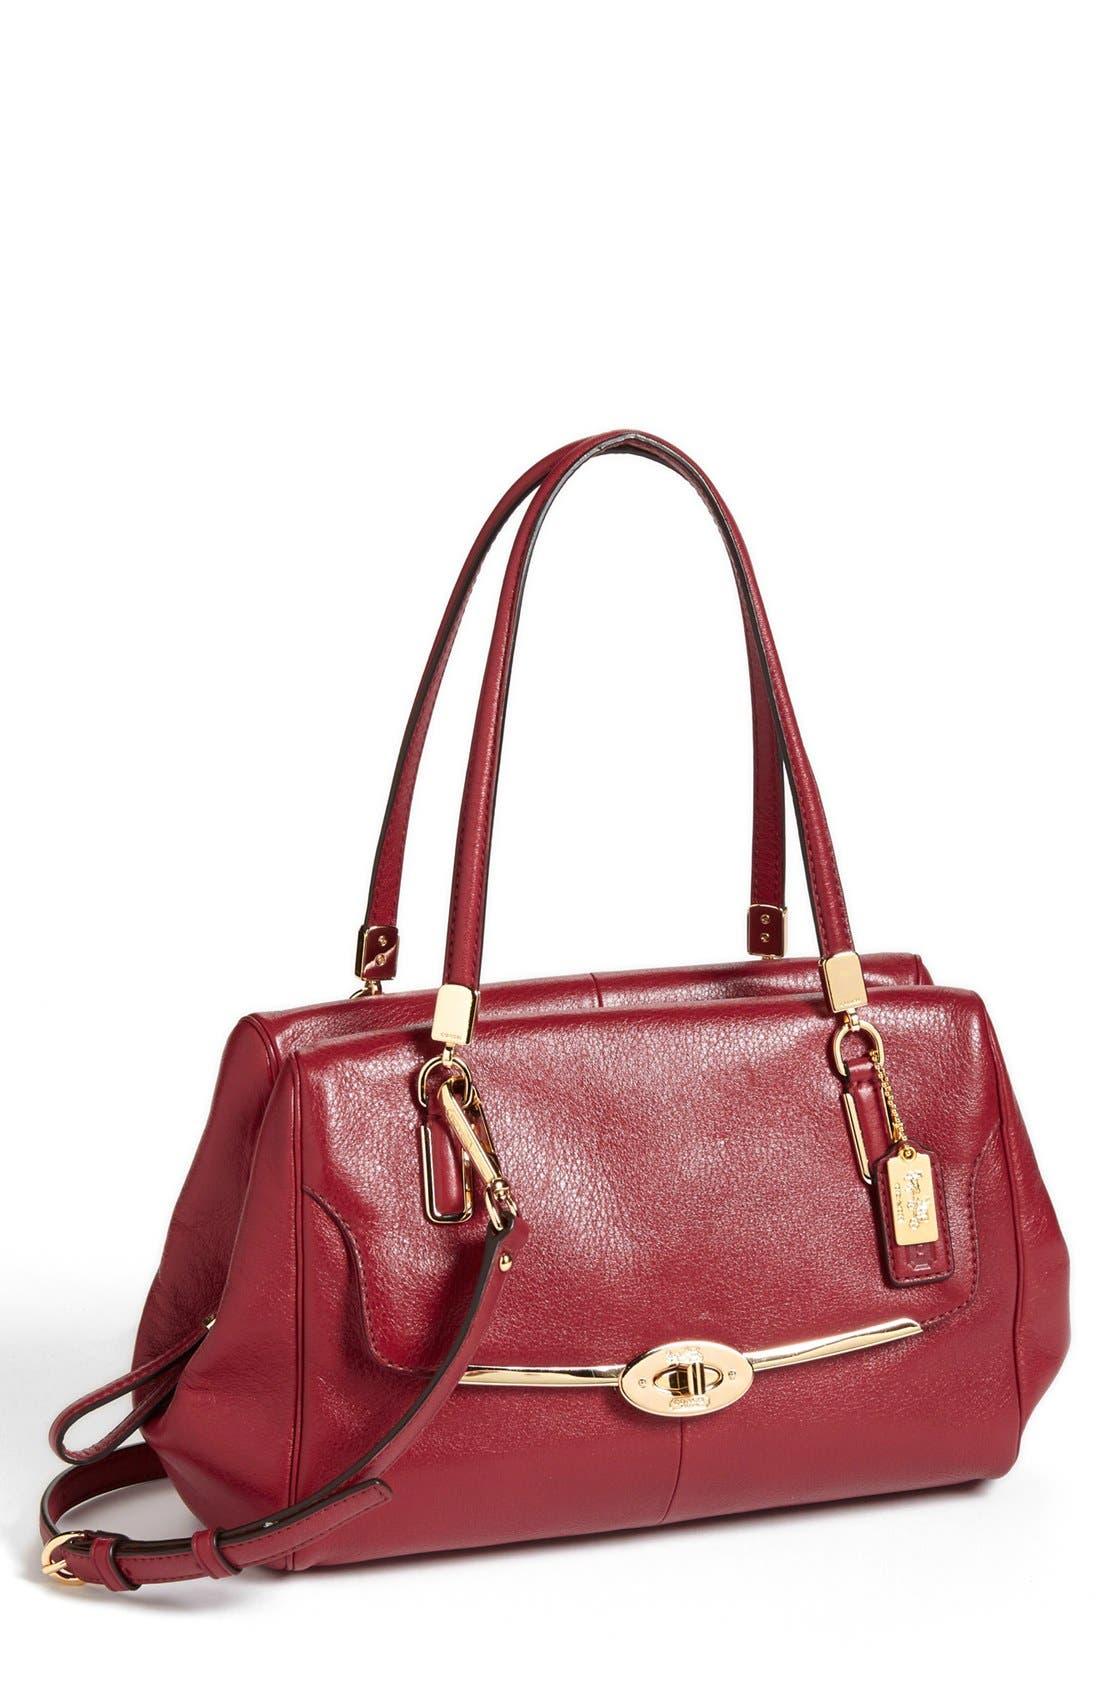 Alternate Image 1 Selected - COACH 'Madison' Leather Crossbody Bag